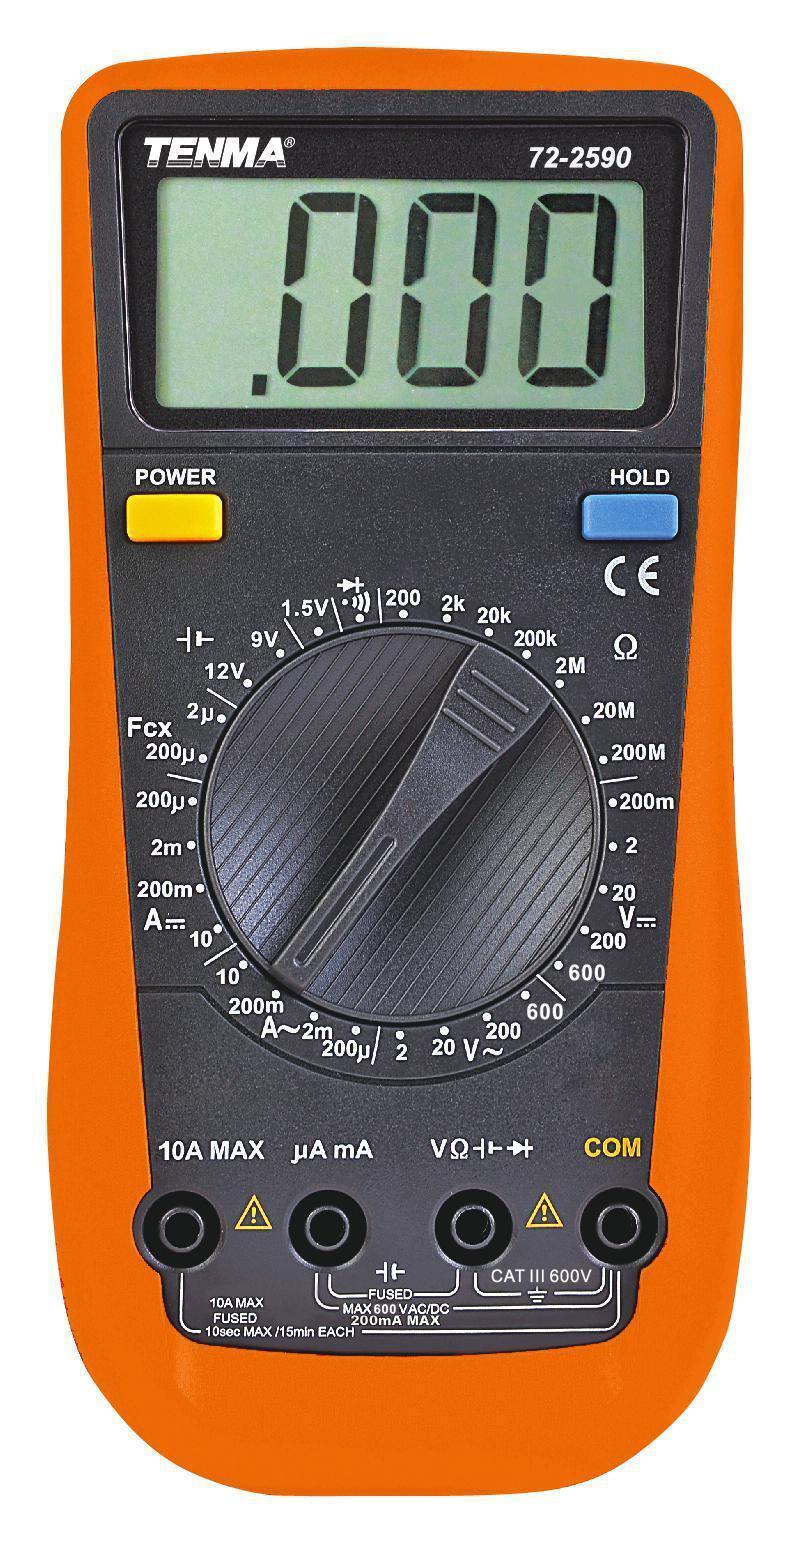 Tenma 3.5 Digit Handheld Manual Ranging Digital Multimeter Ac dc Voltage